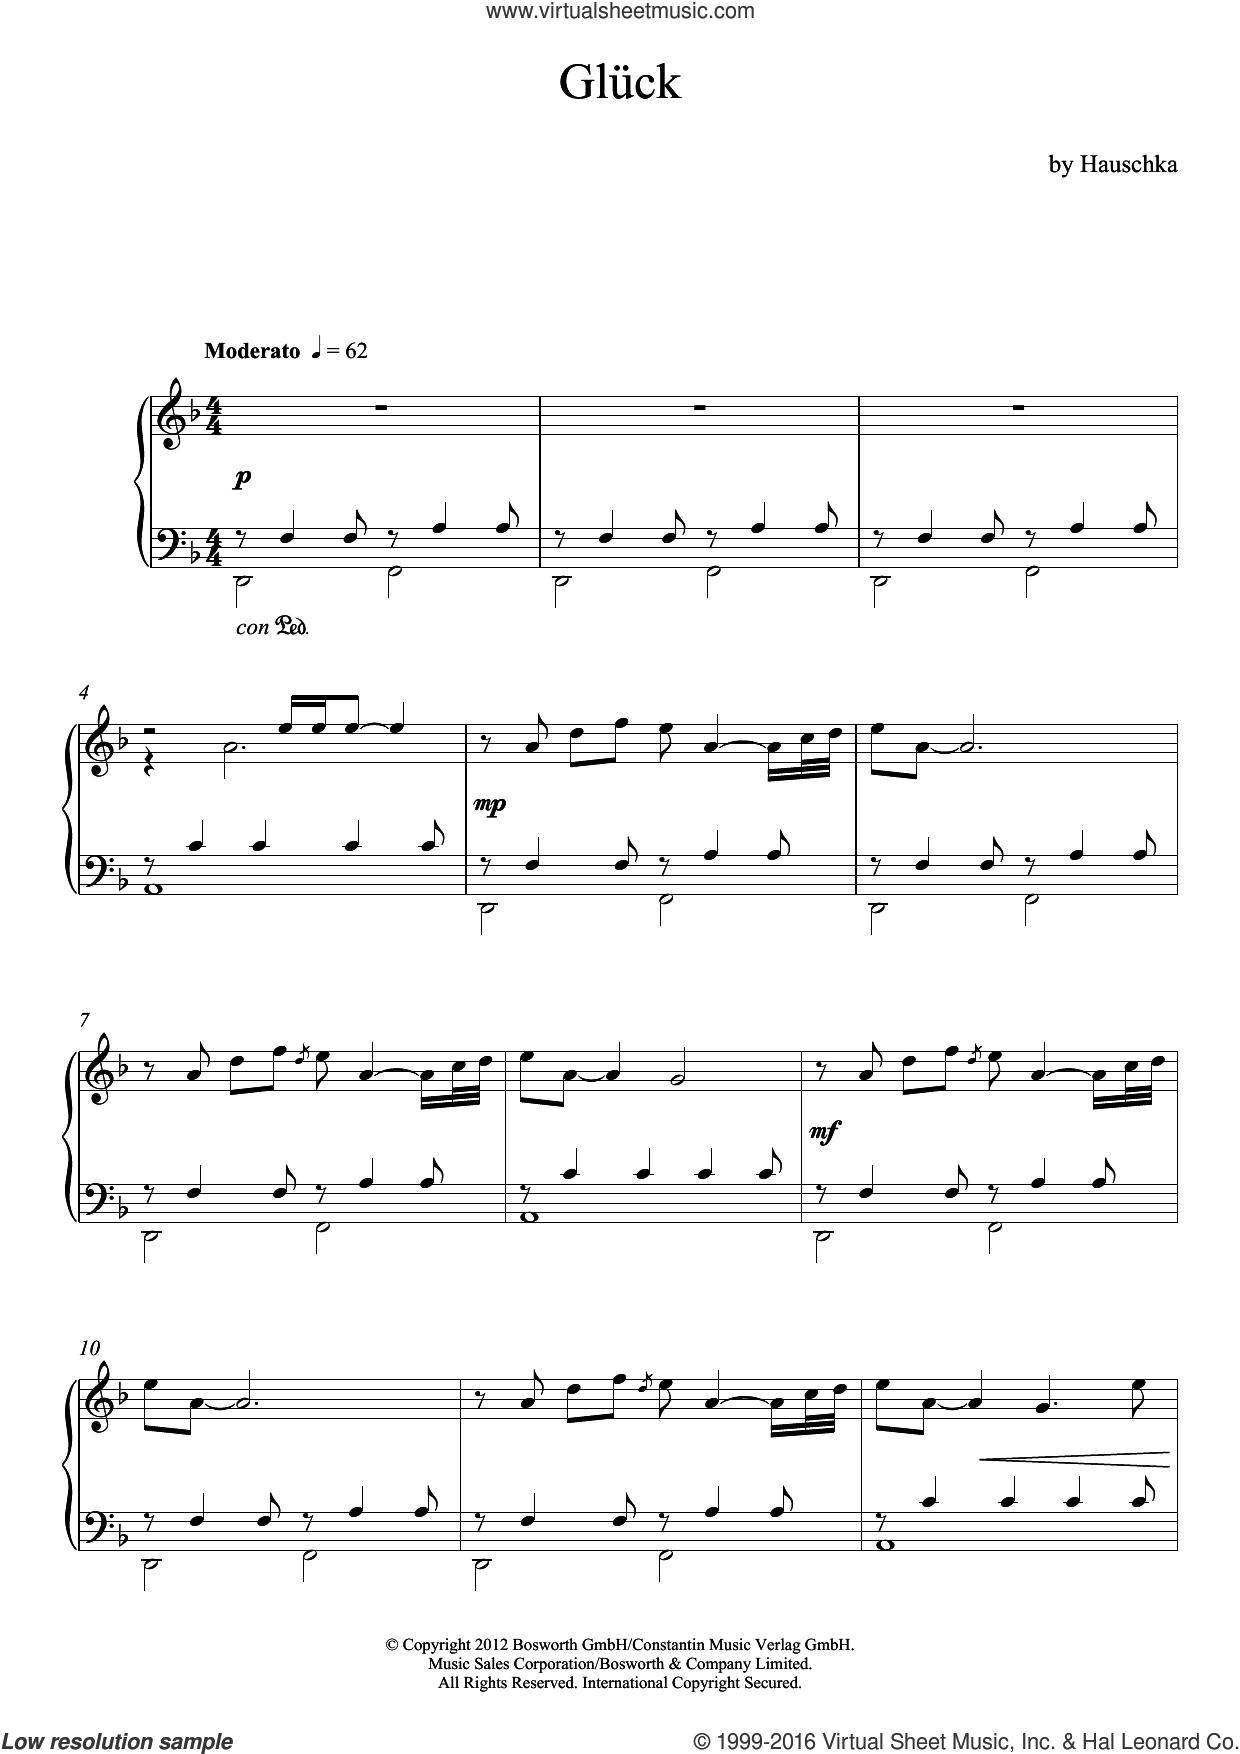 Gluck (Theme) sheet music for piano solo by Hauschka and Volker Bertelmann, classical score, intermediate skill level